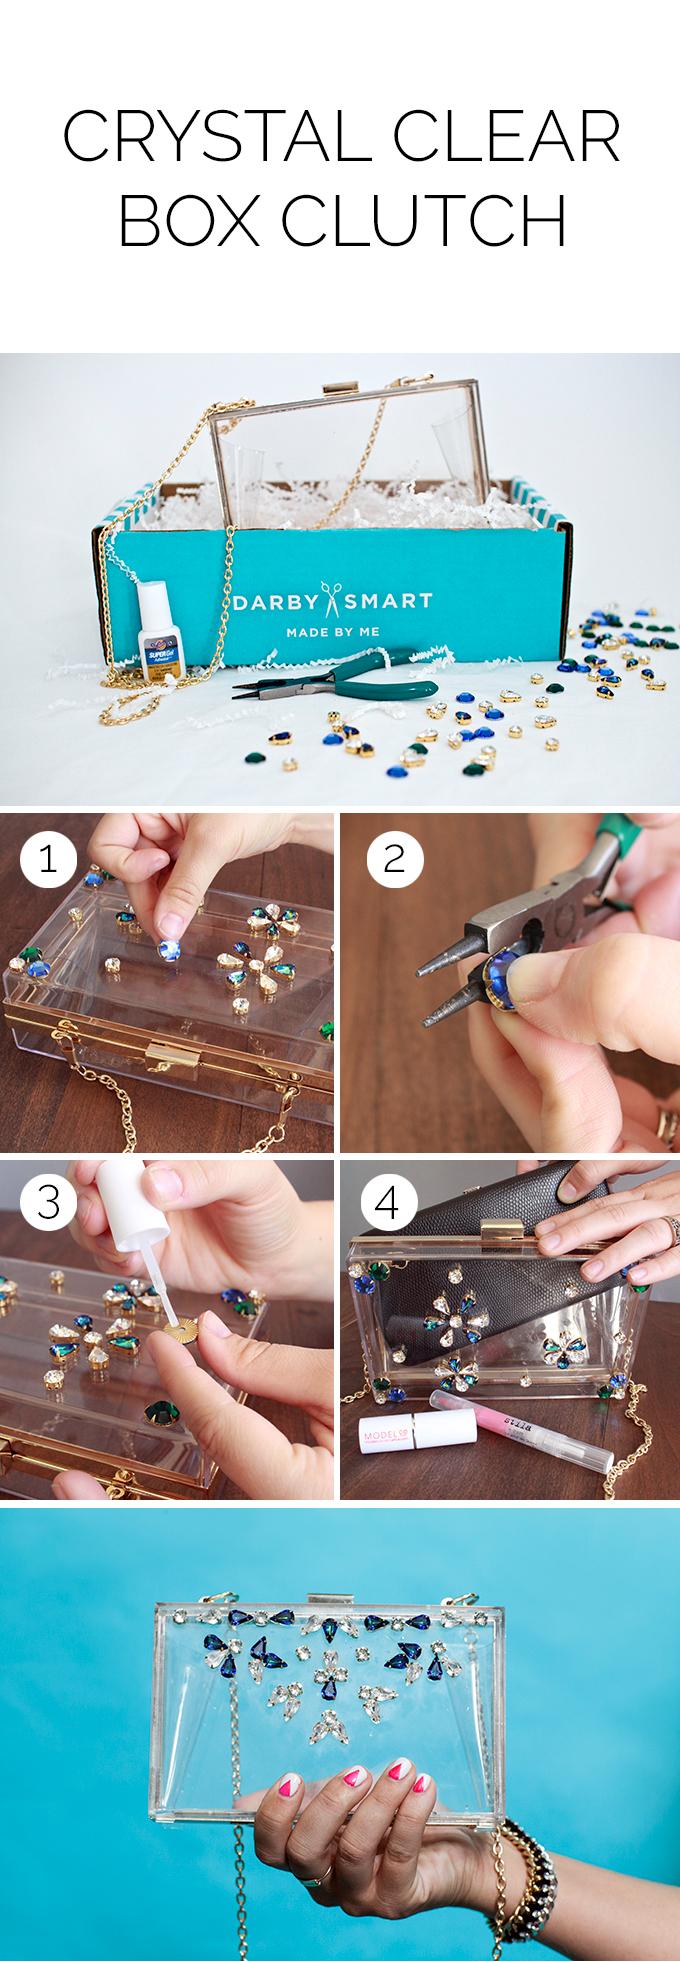 Darby Smart craft sets